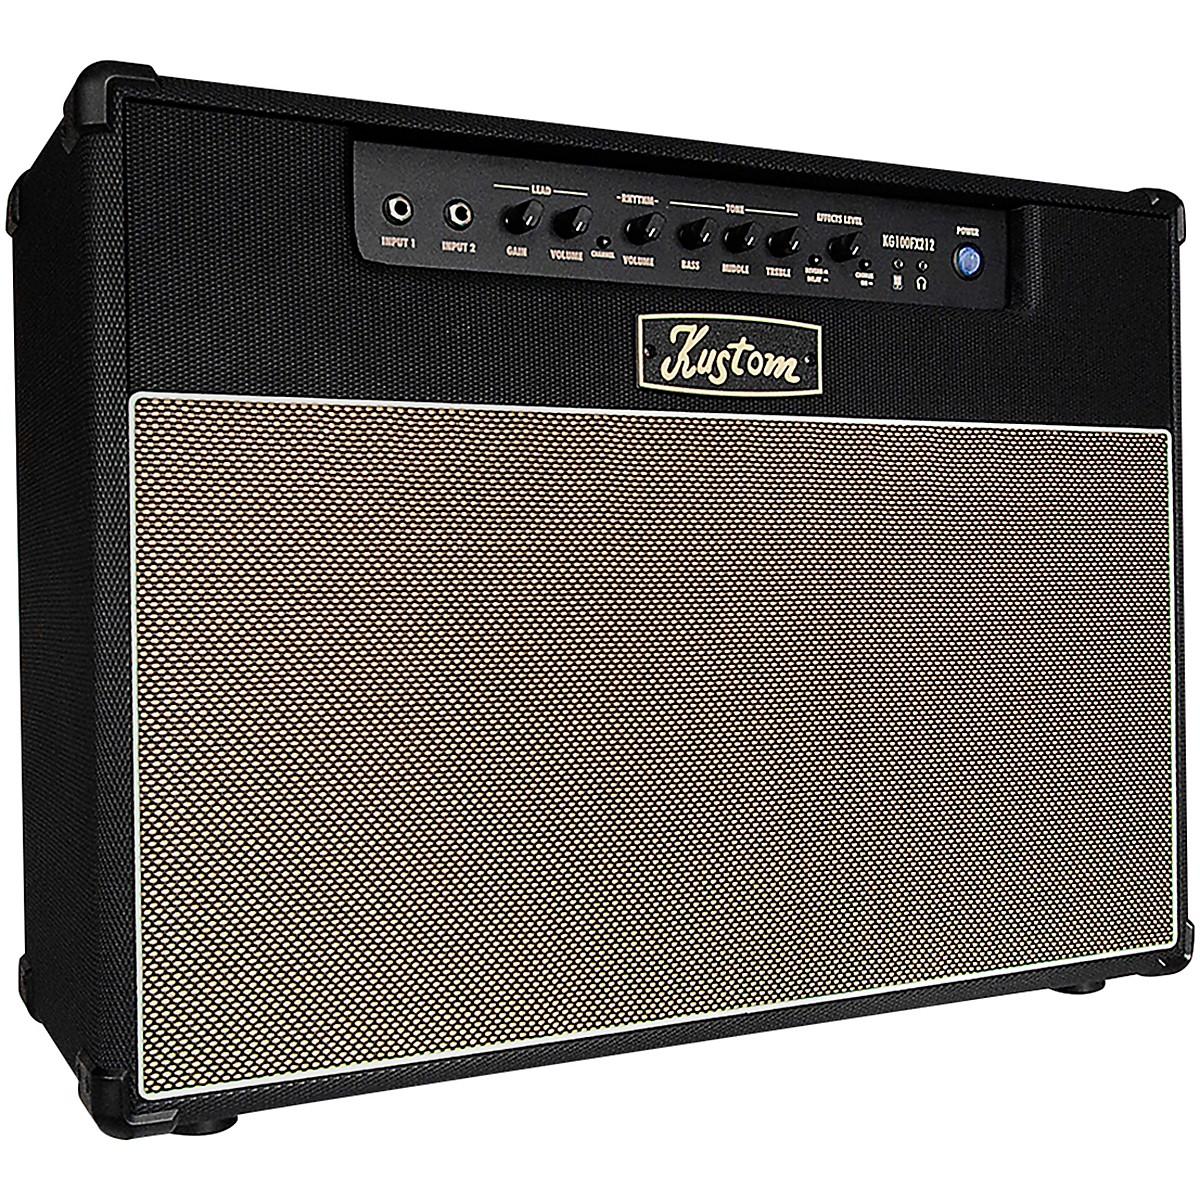 Kustom KG100FX212 100-Watt 2x12 Guitar Combo Amplifier